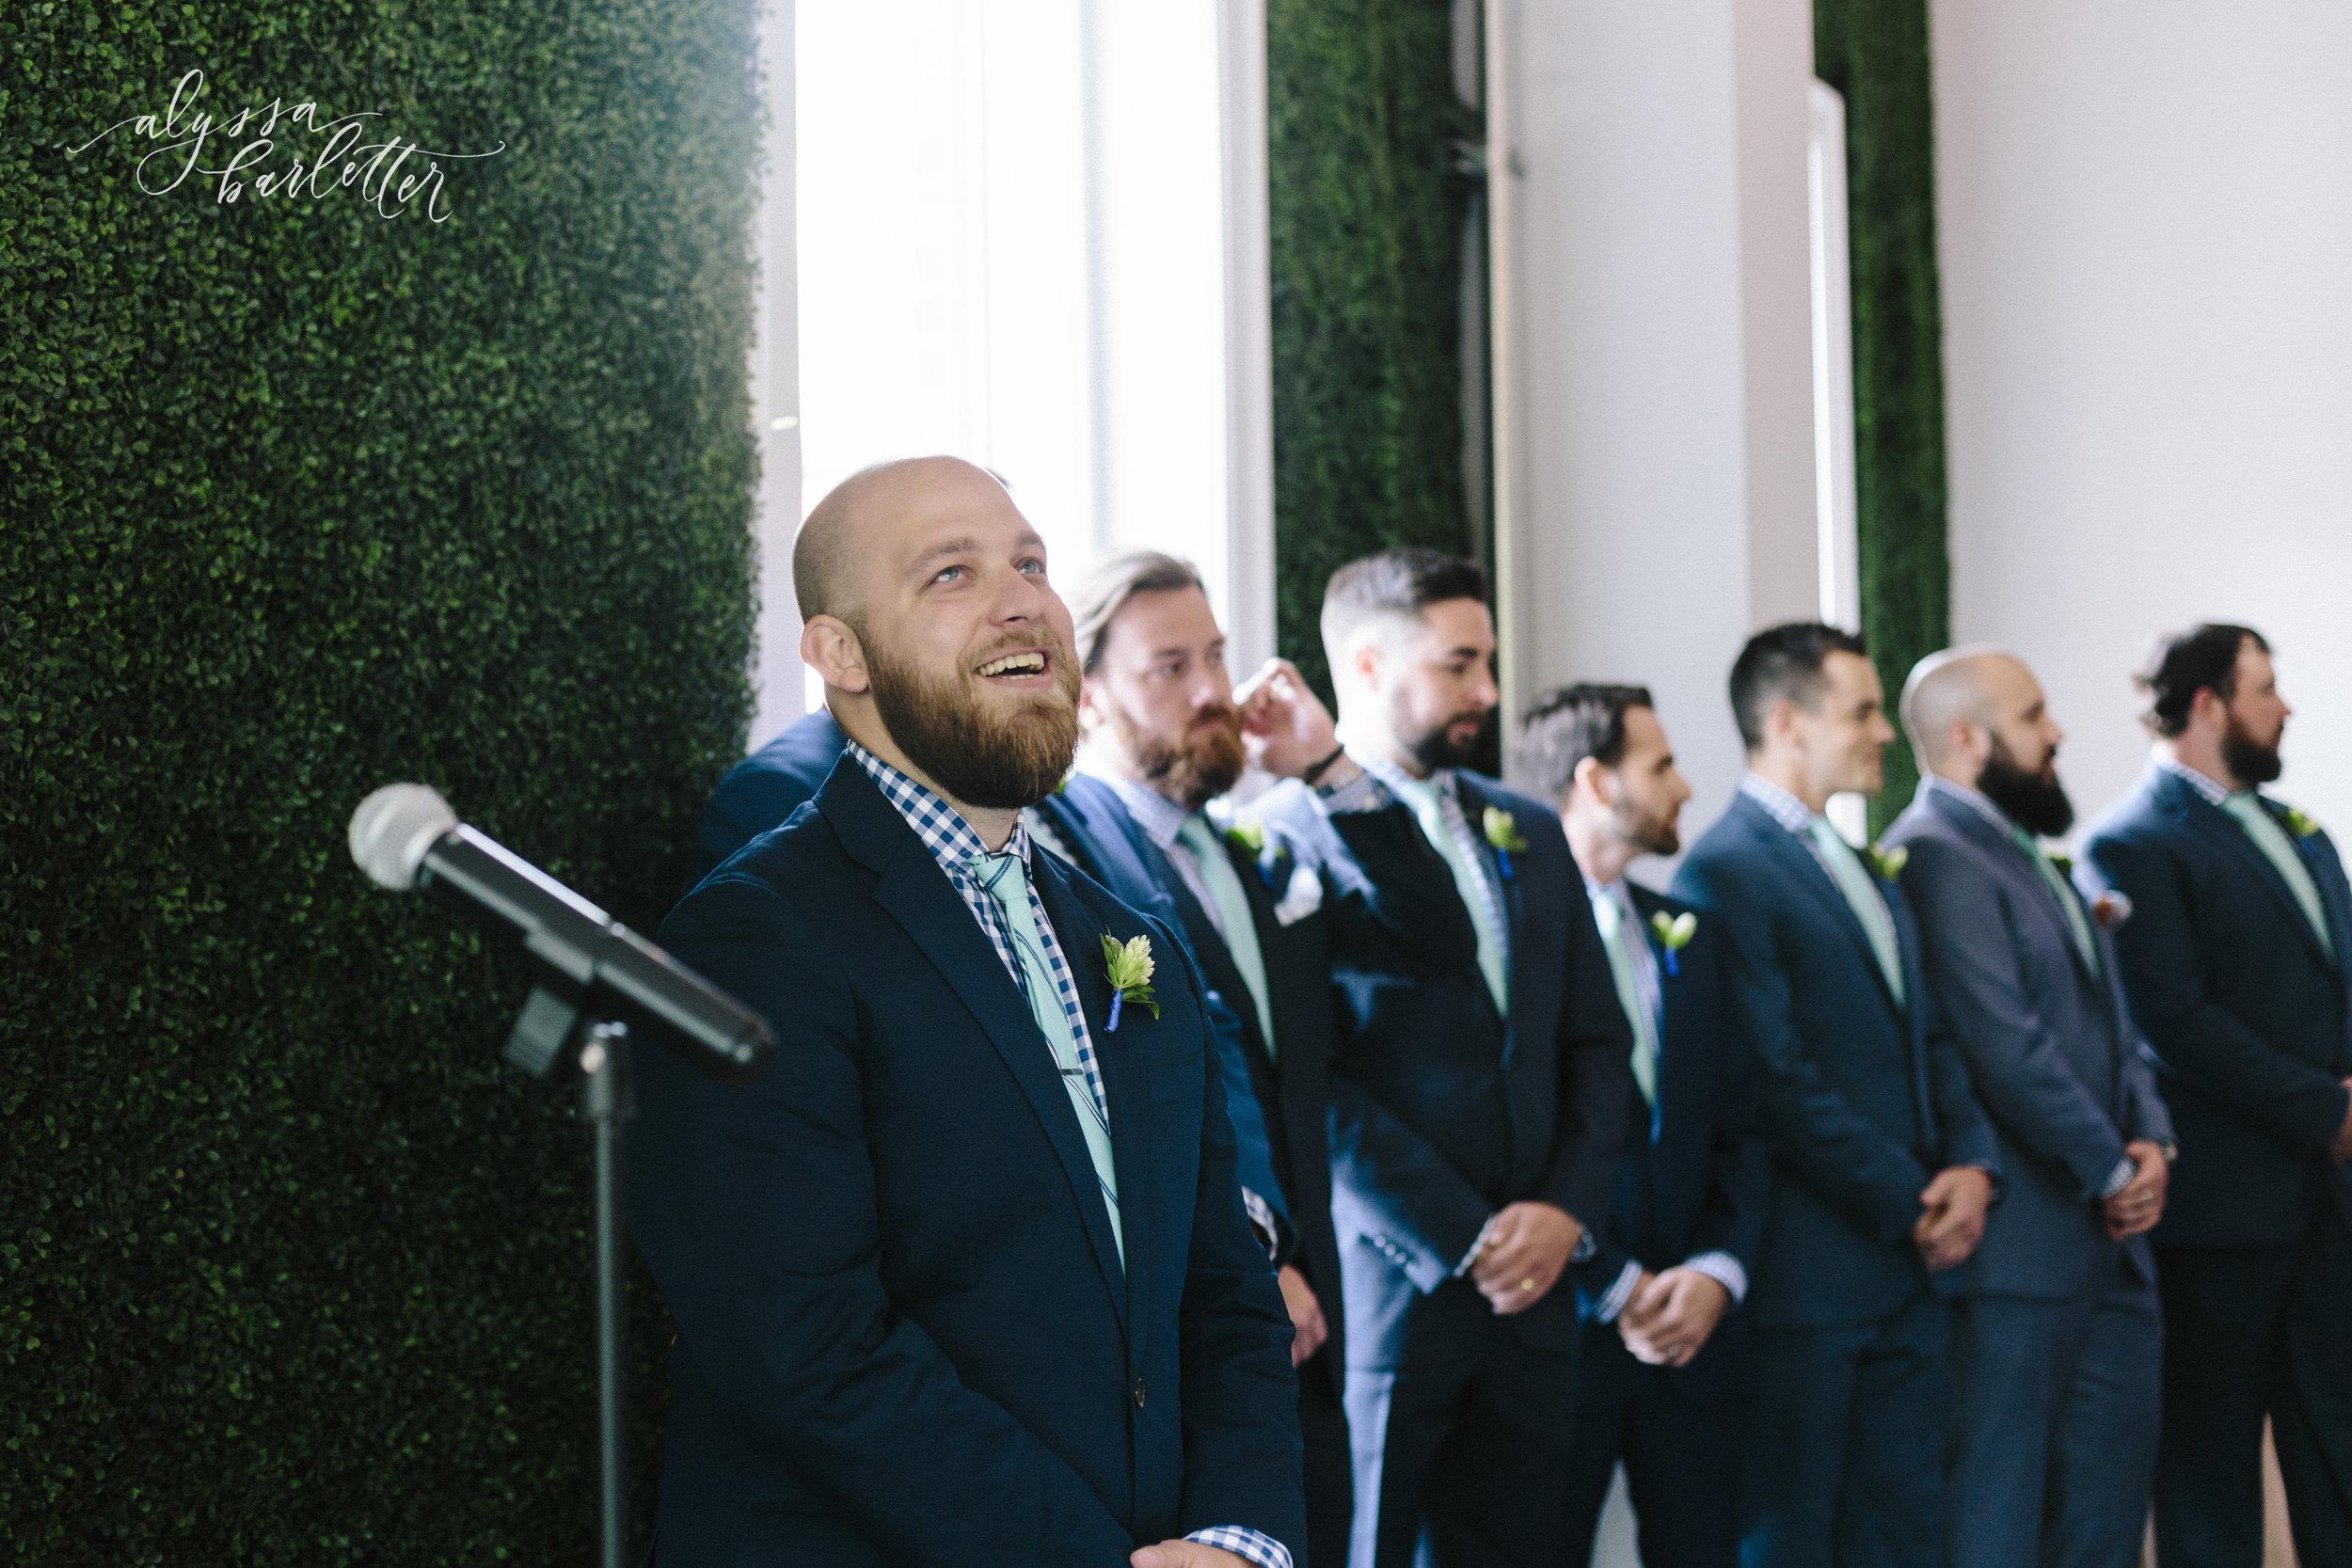 alyssa barletter photography kansas city wedding 2016 main courtney and brian-1-16.jpg